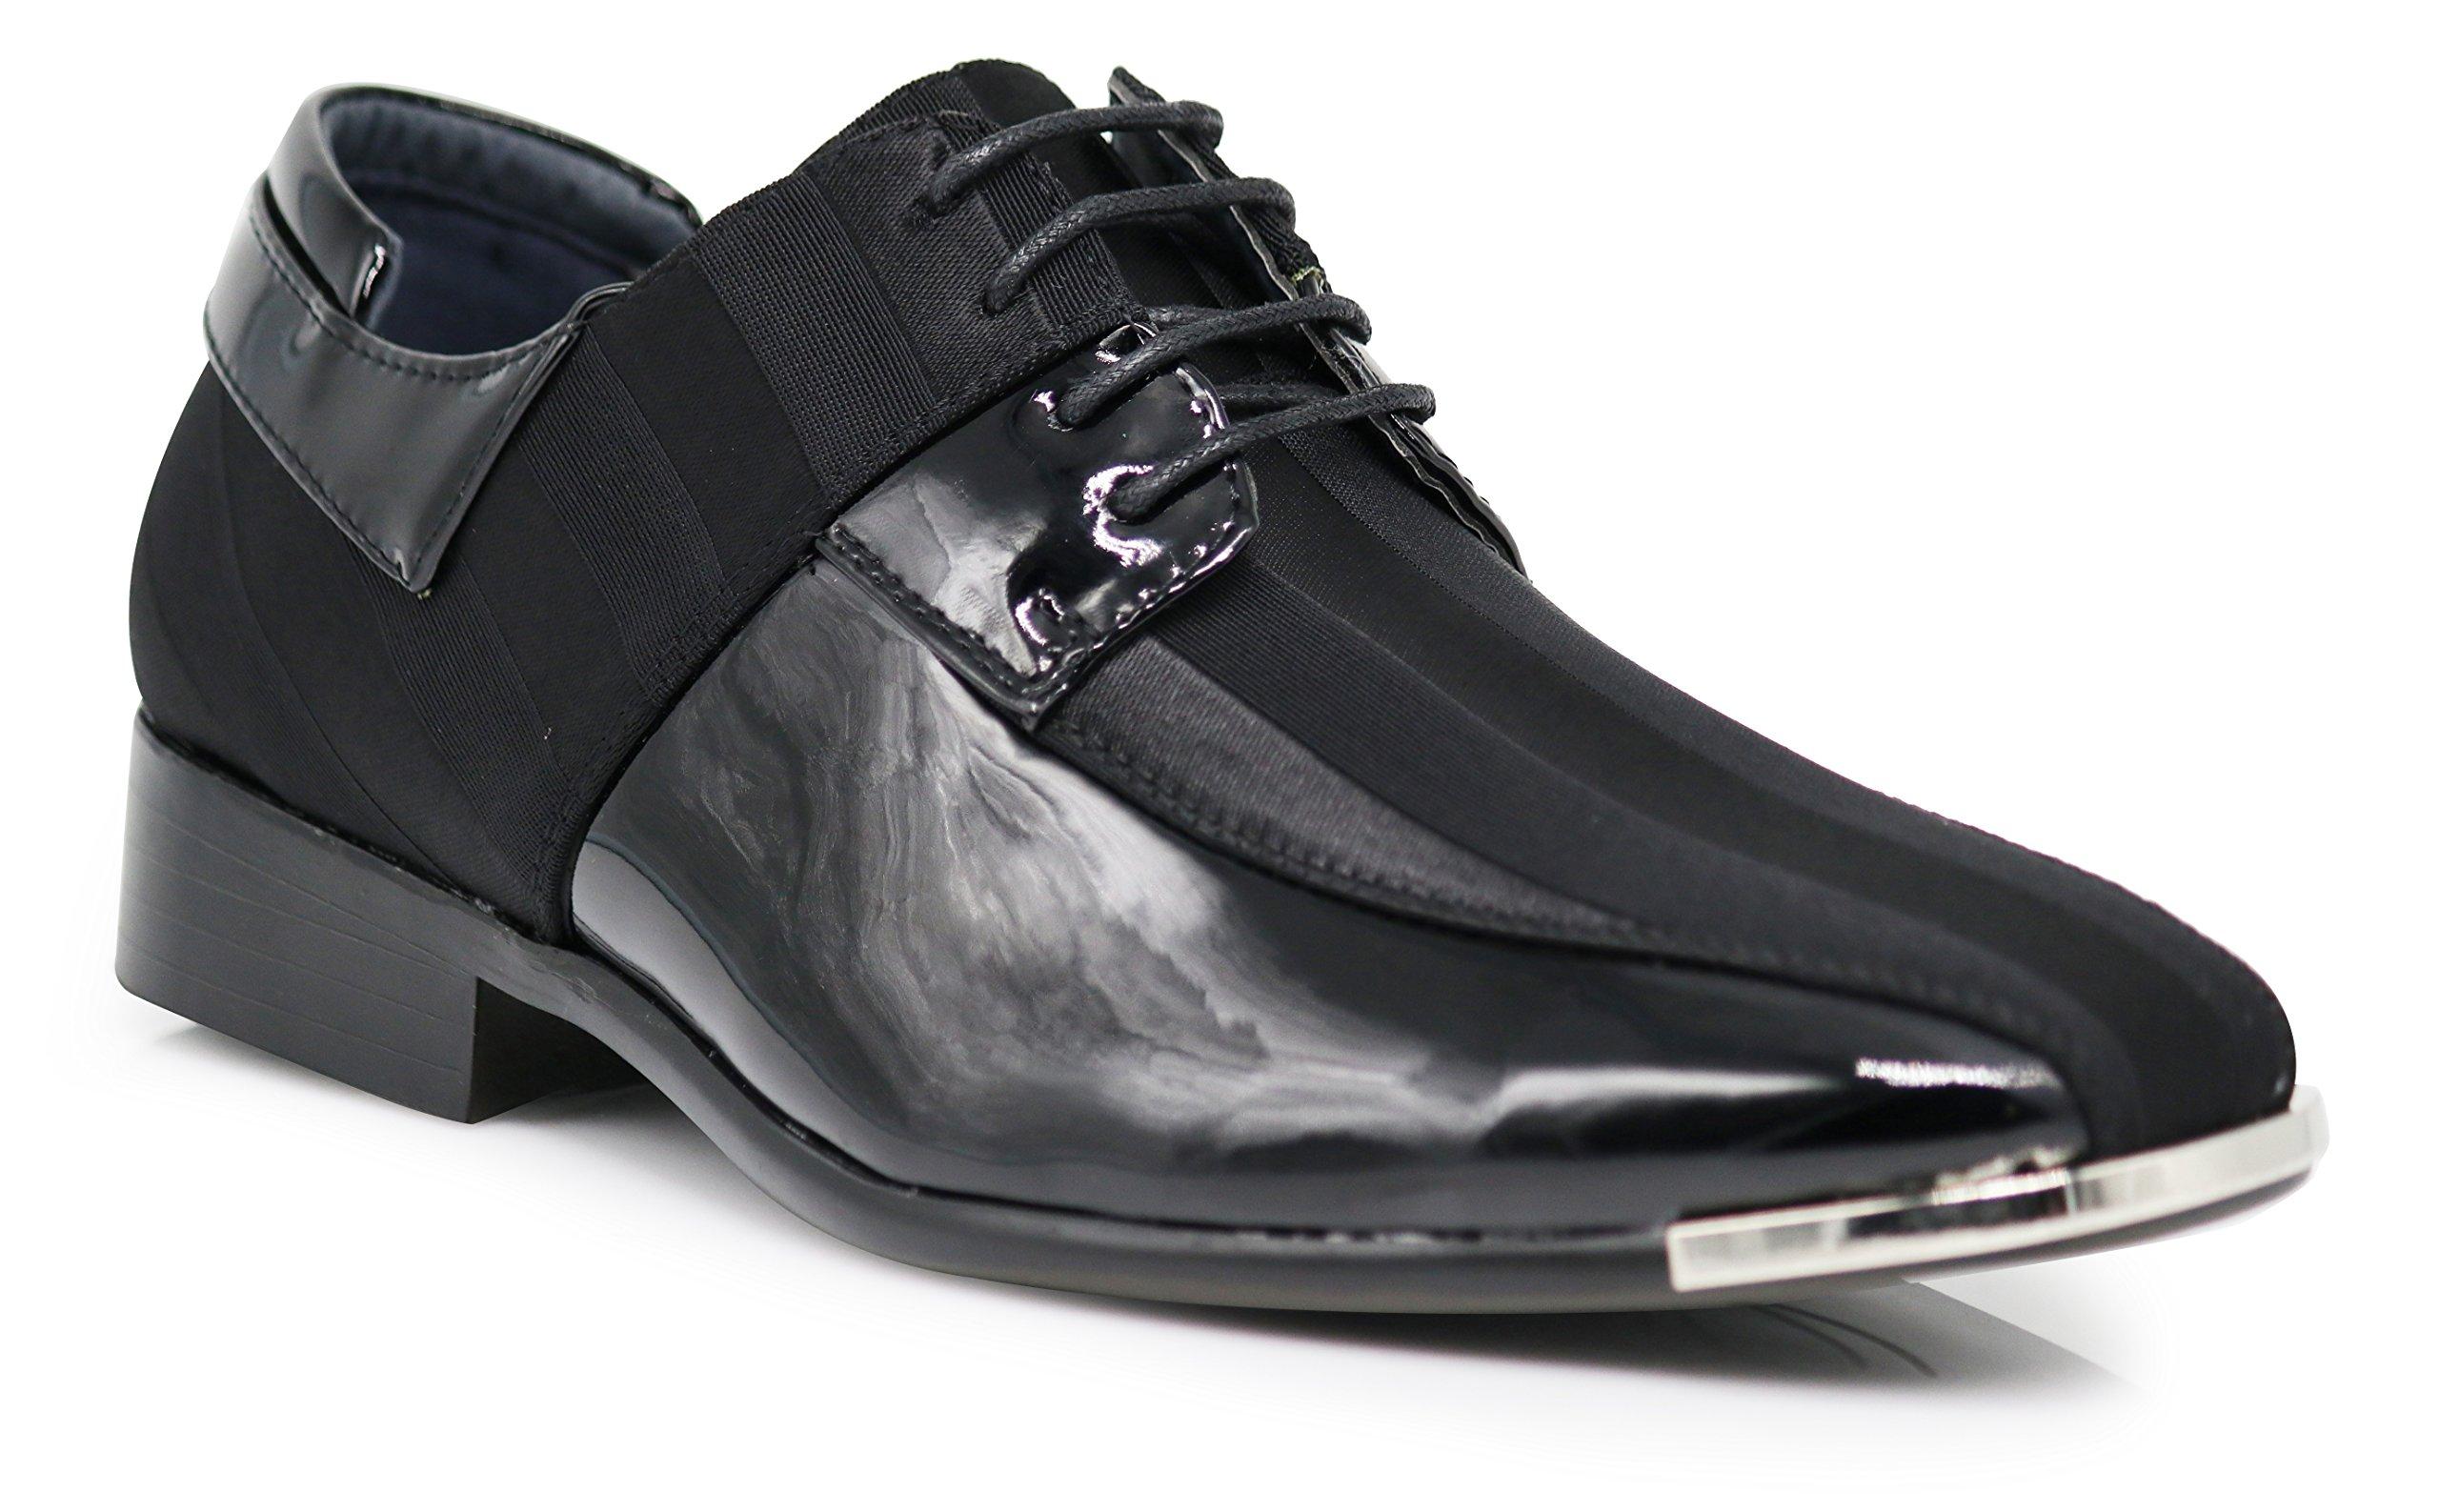 JY5N Men's Satin Metal Silver Tip Oxfords Tuxedo Dress Shoes Stripes Church Wedding Party Groomsmen Oxfords Dress Shoes (12 D(M) US, Black)